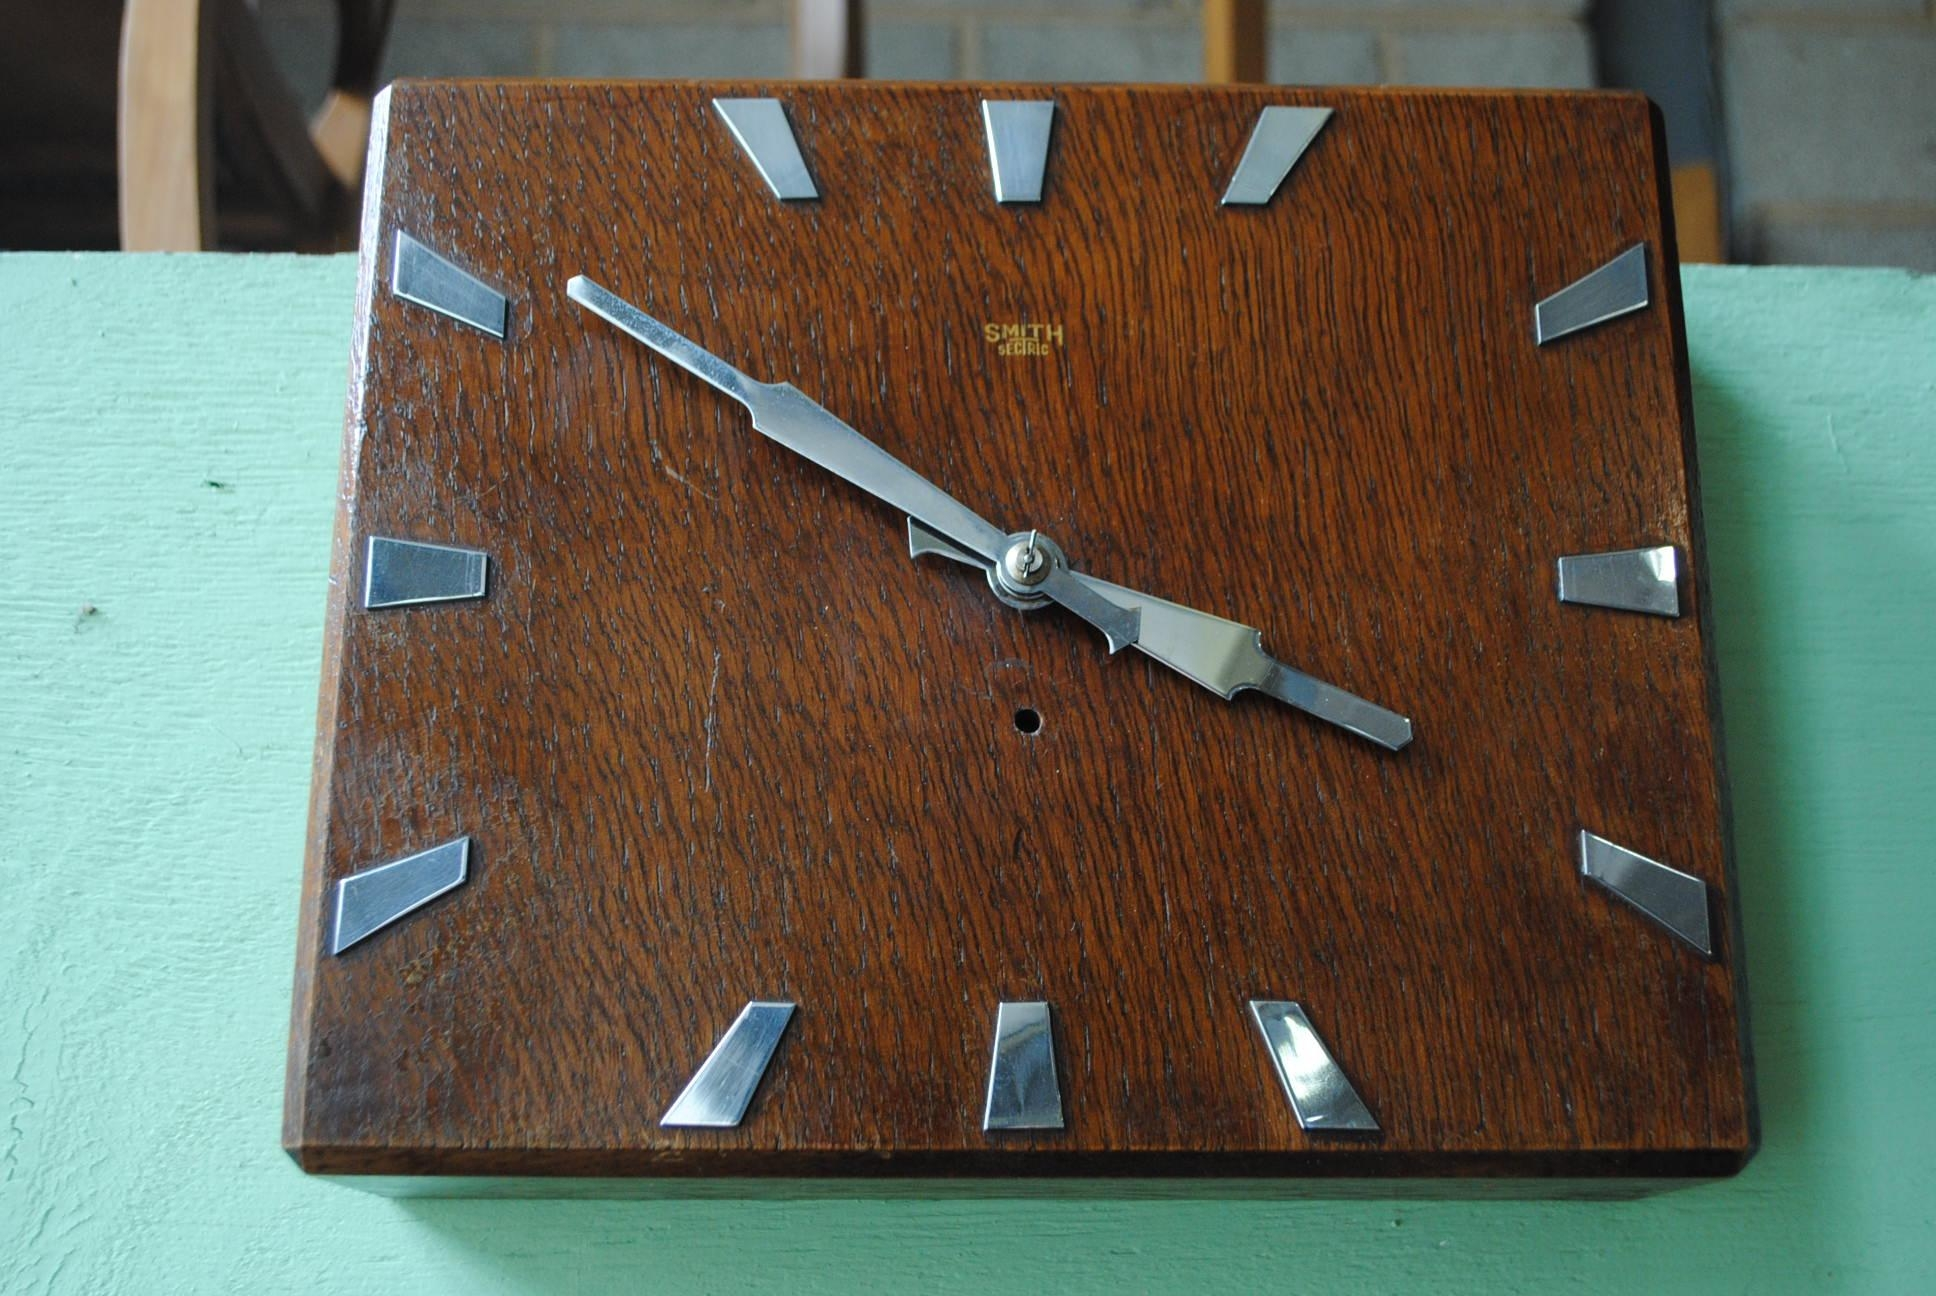 Art Deco Wall Clock || Cloud 9, Art Deco Furniture Sales Intended For Art Deco Wall Clocks (Image 6 of 20)